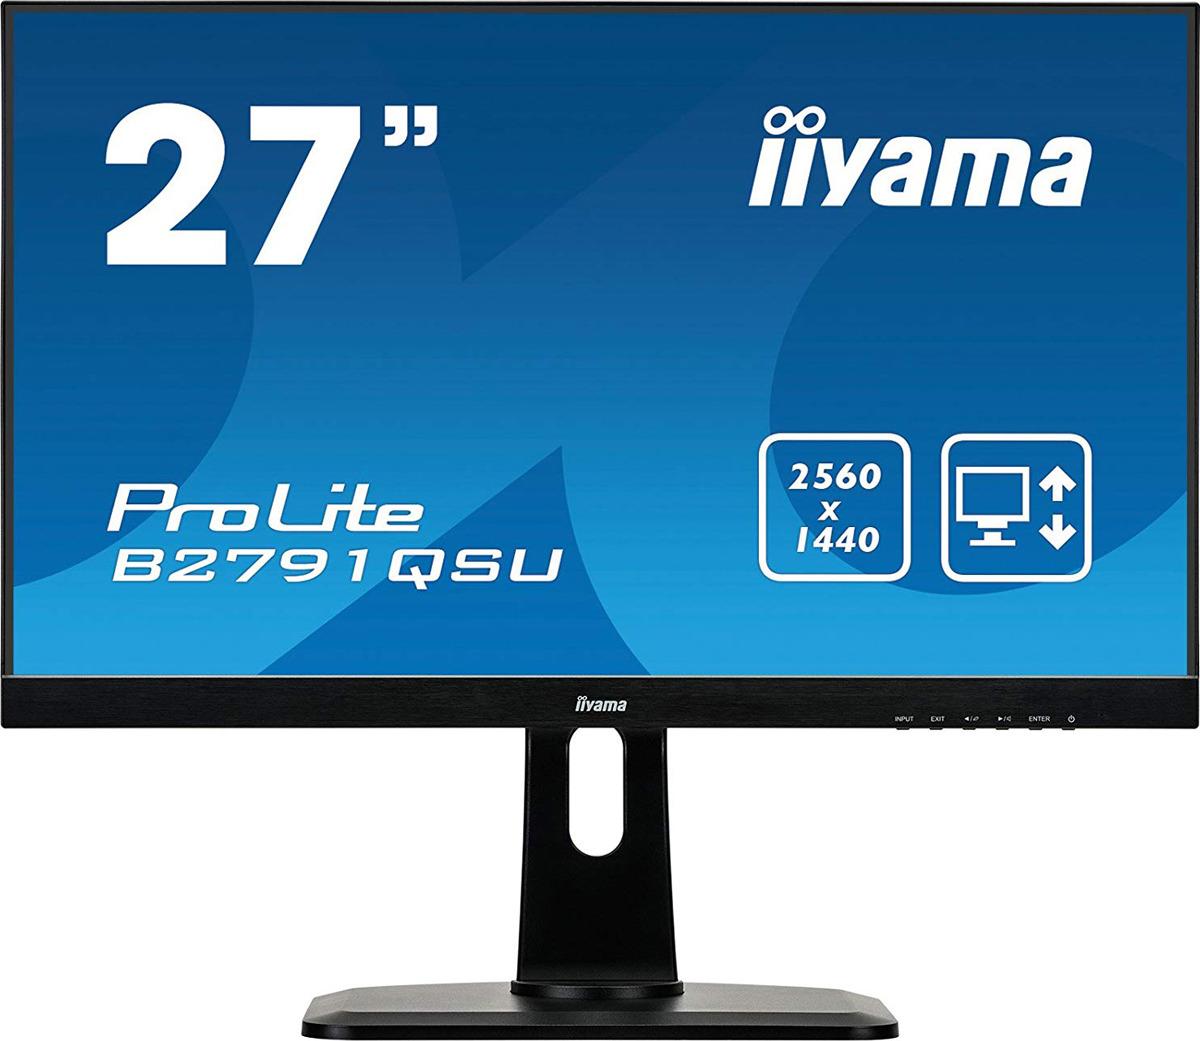 Монитор Iiyama 27 ProLite B2791QSU-B1, черный монитор iiyama prolite b2791qsu b1